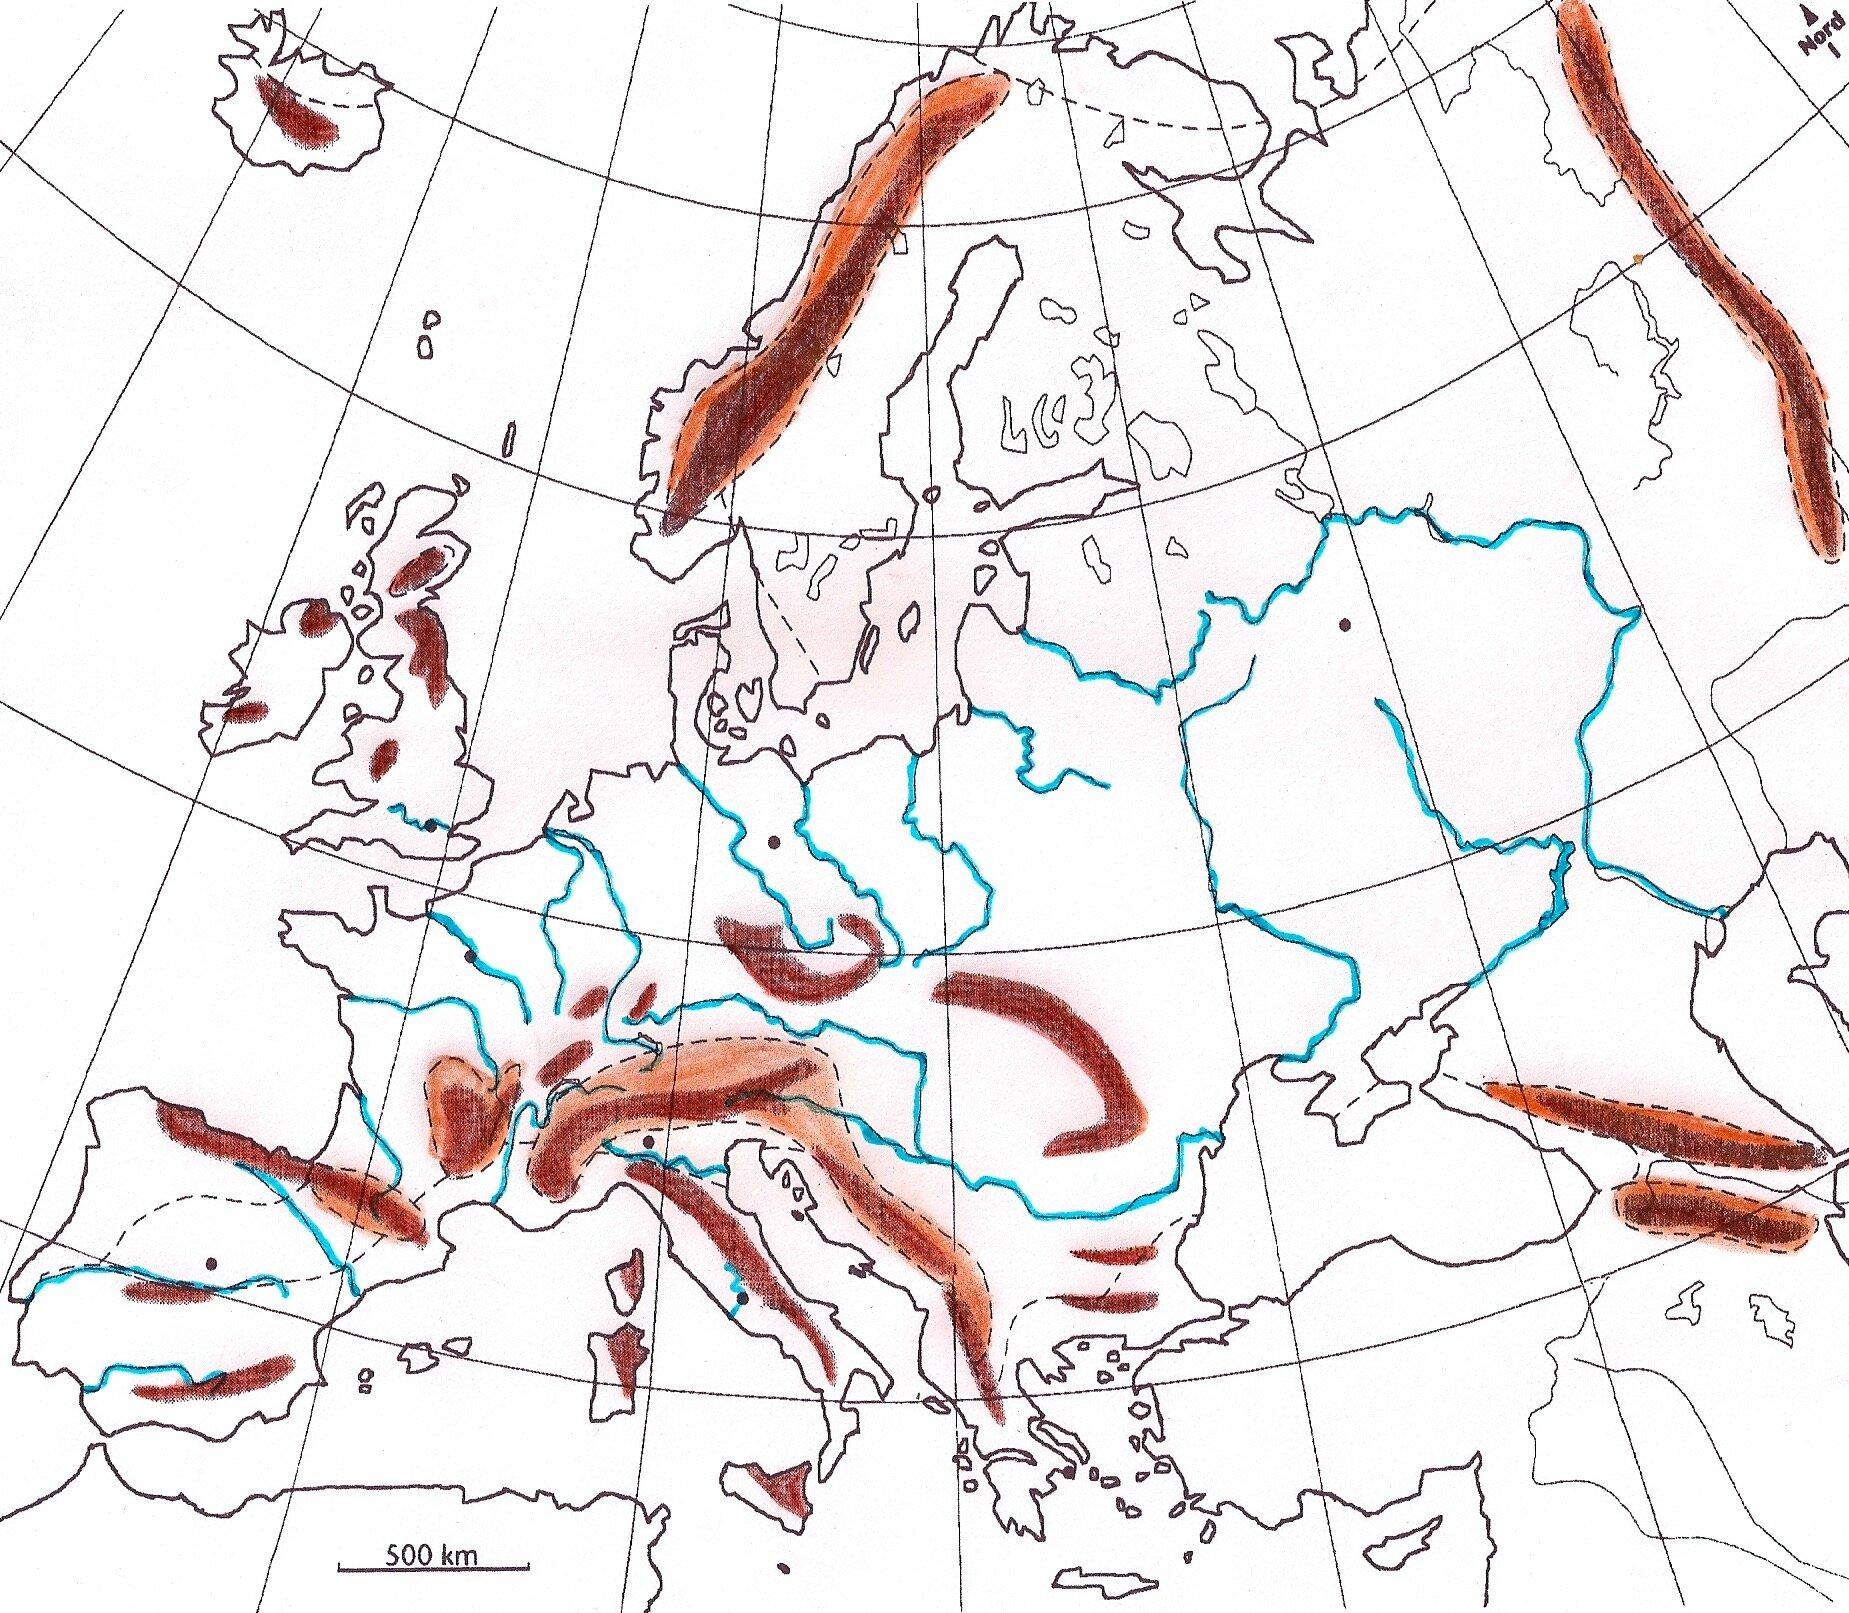 carte europe fleuves principaux